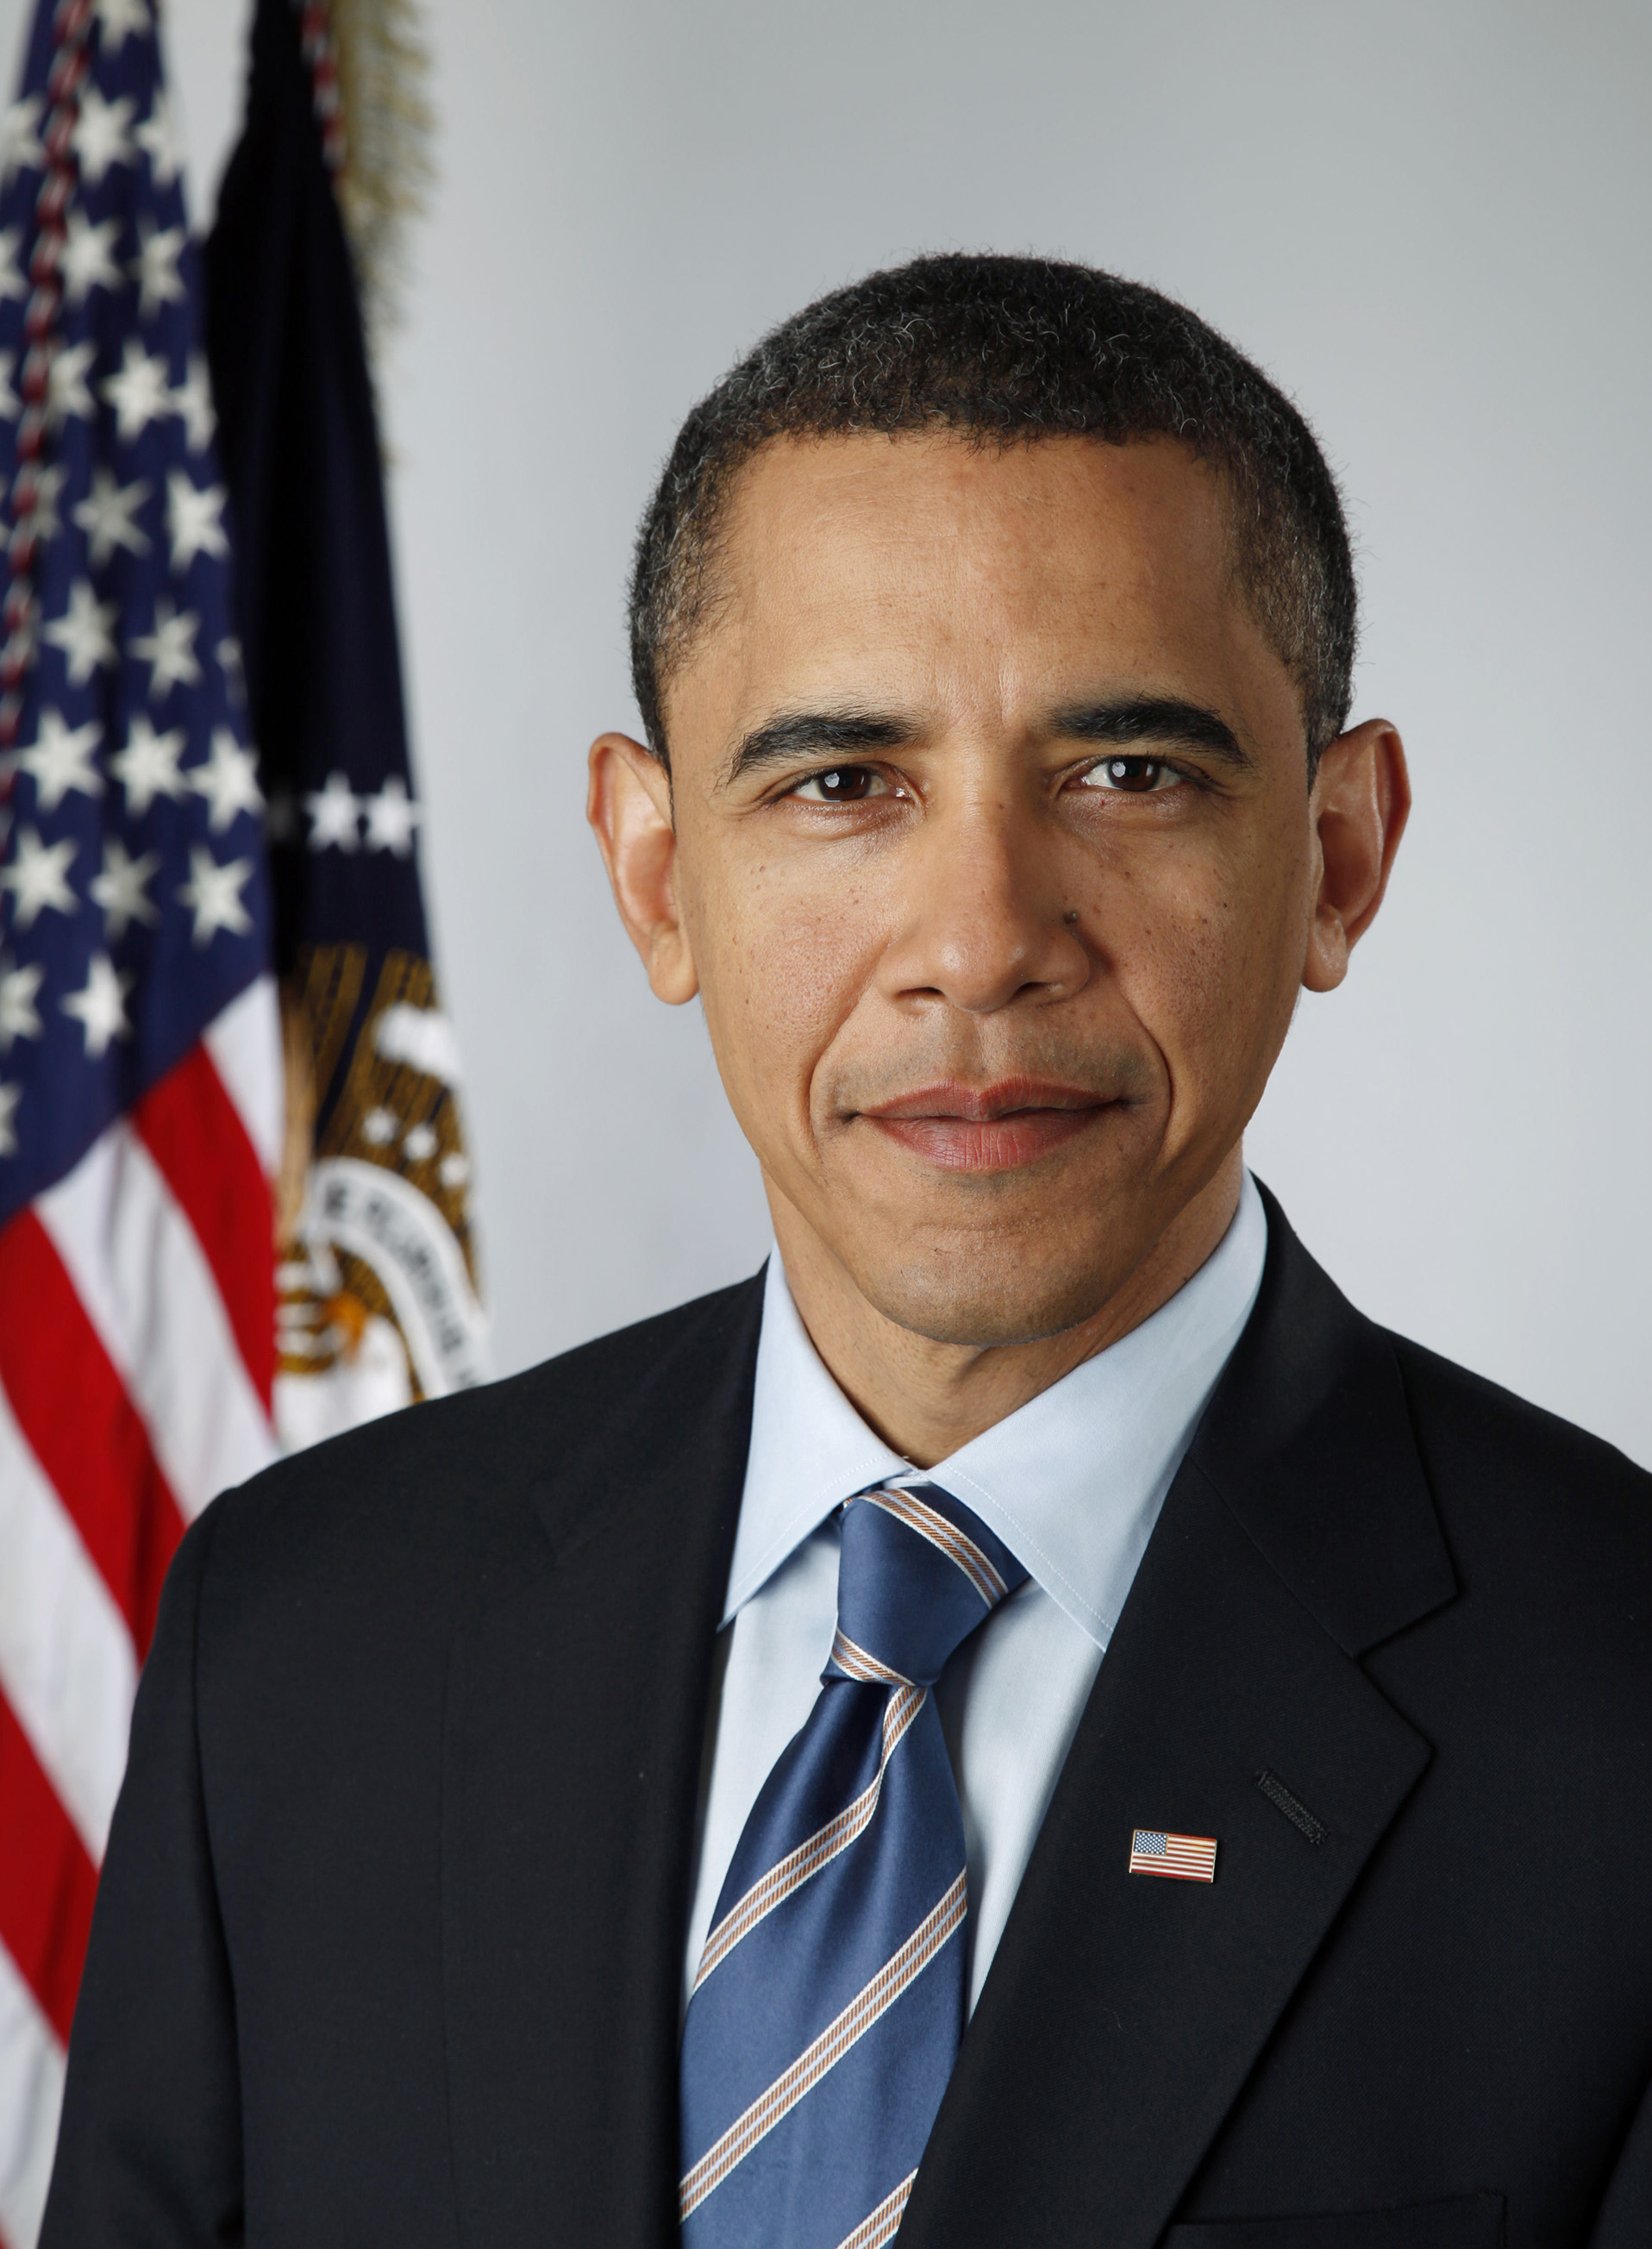 Obama 2022 - Copy - Copy - Copy.jpg